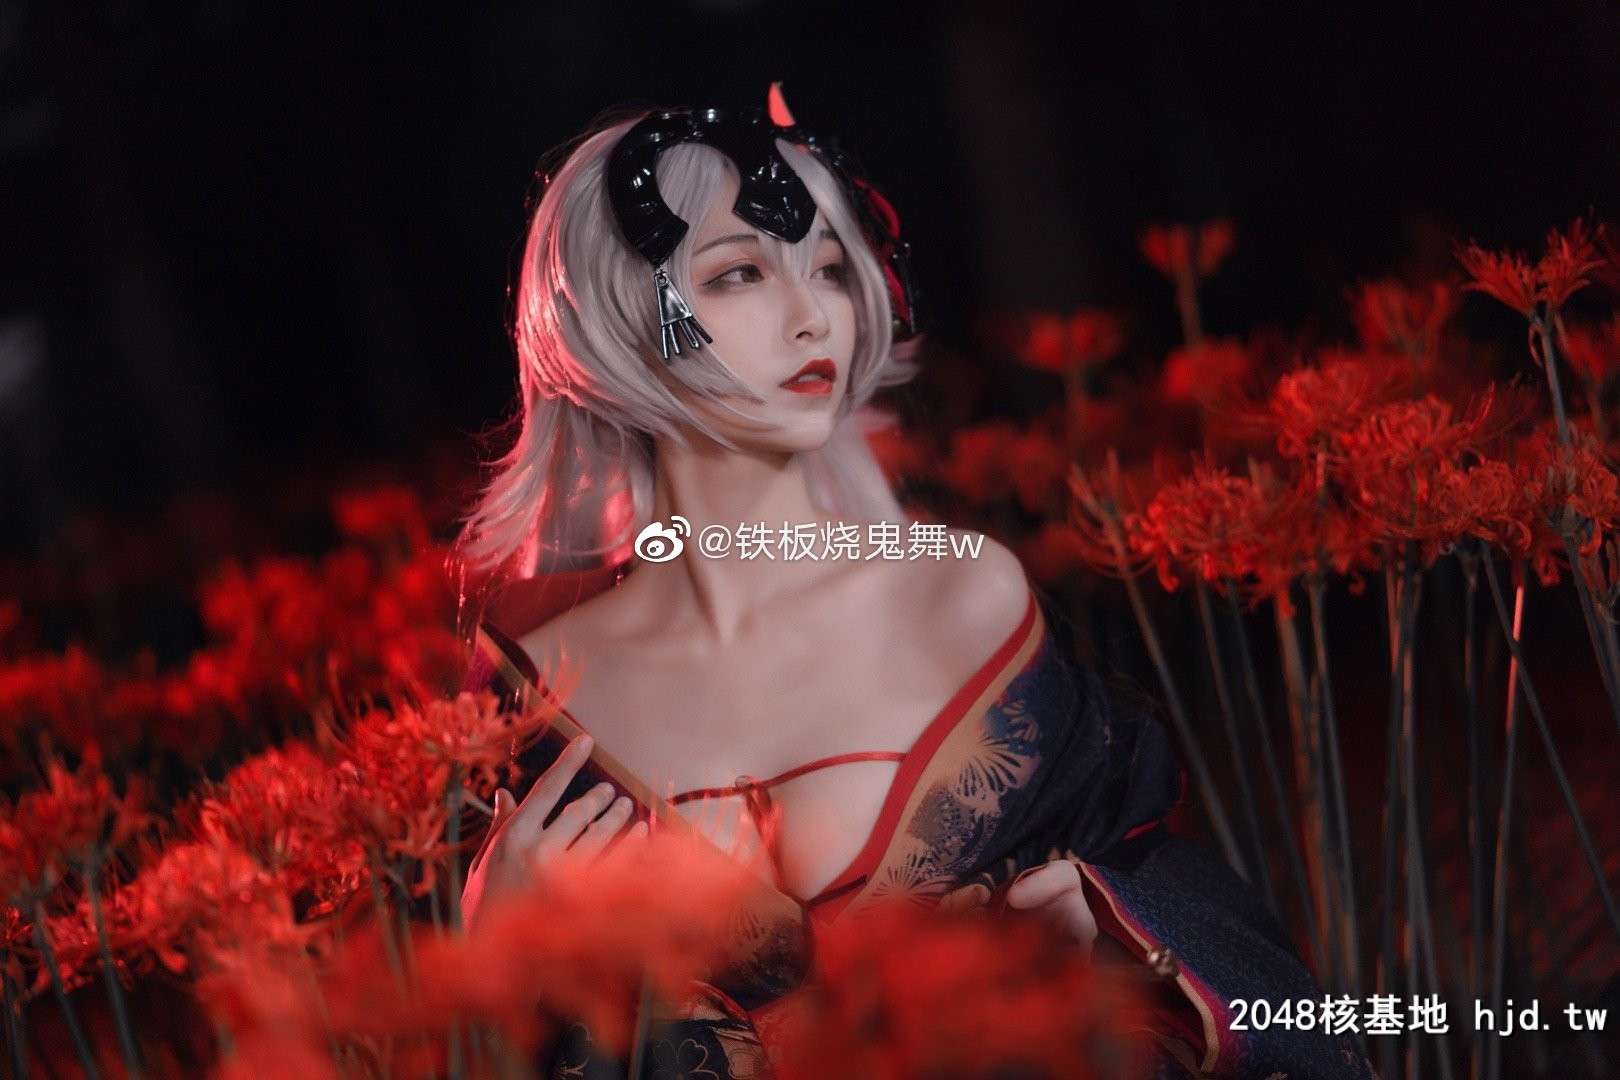 FGO黑贞德@铁板烧鬼舞w (9P)插图(7)